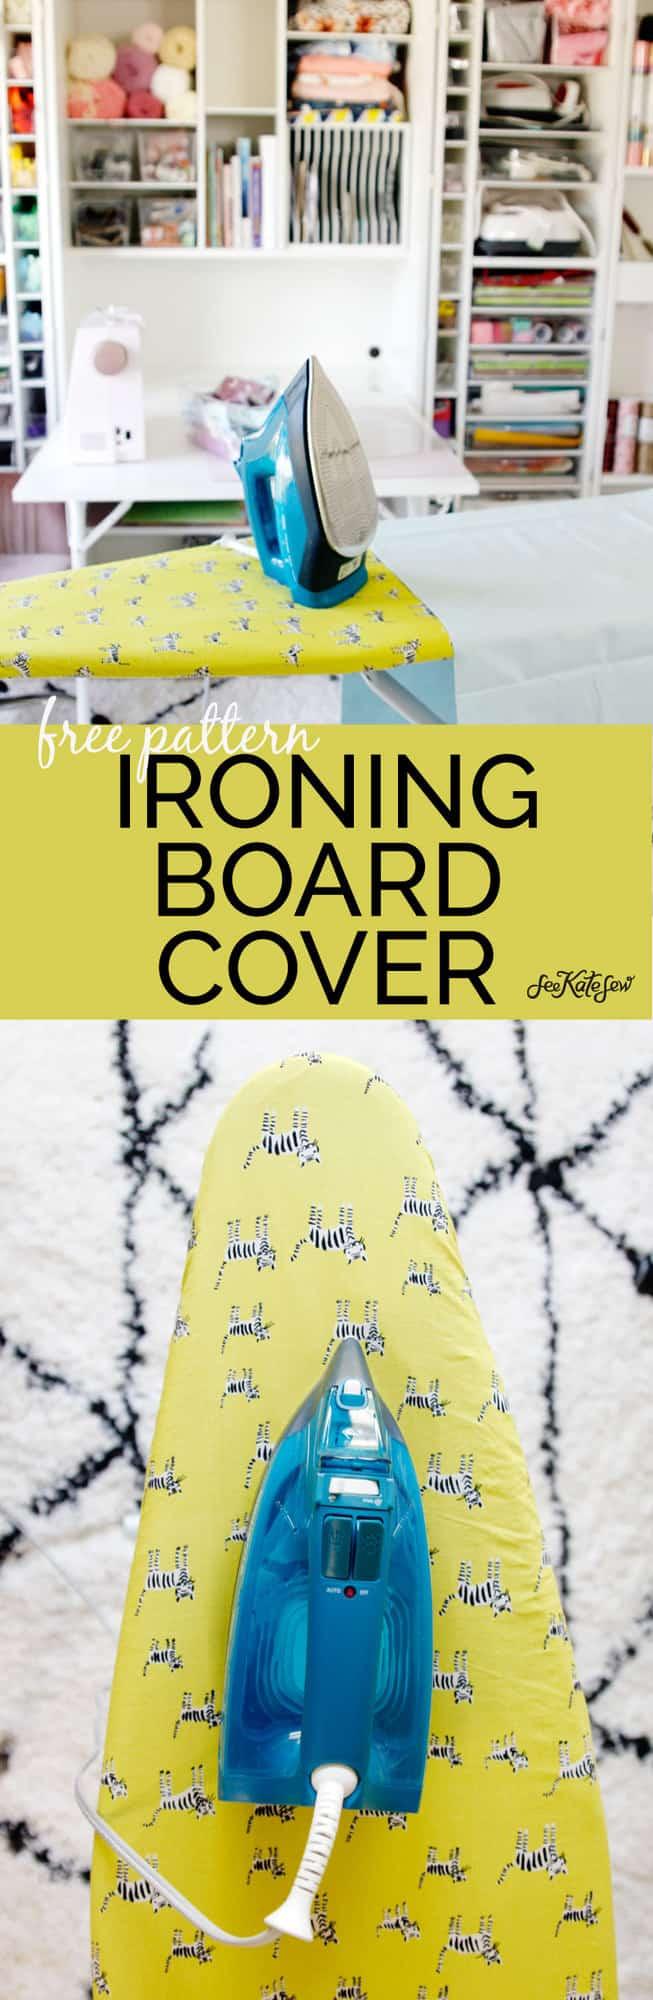 Free Pattern Ironing Board | See Kate Sew